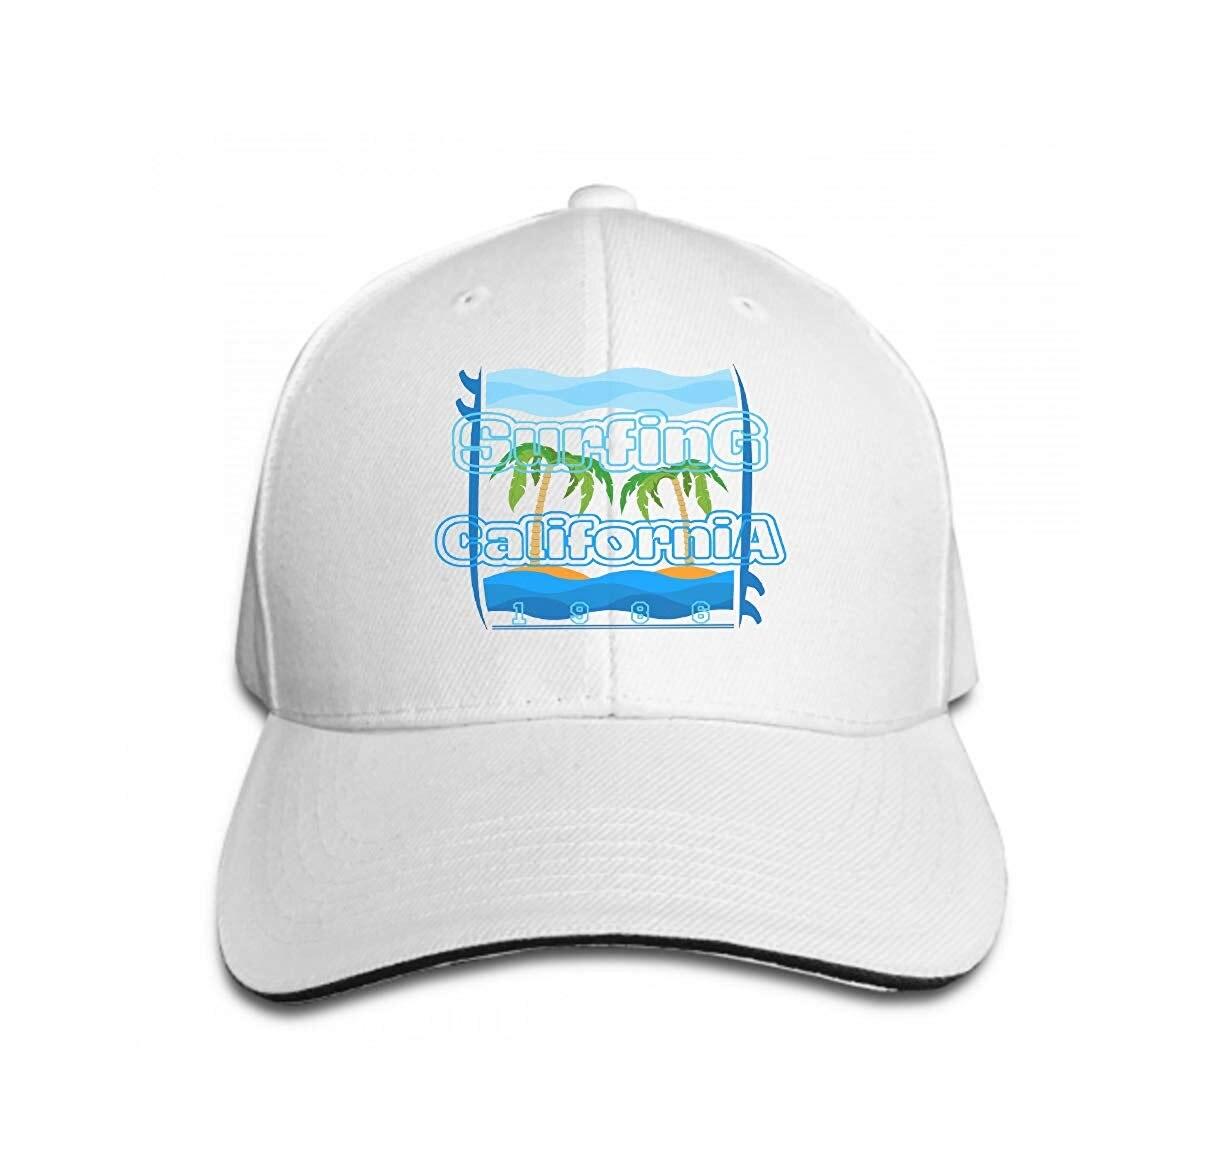 Adjustable Contrast Color Hip Hop Baseball Hats ts surf la Beach California Surfing Inscription Typography GRAP White